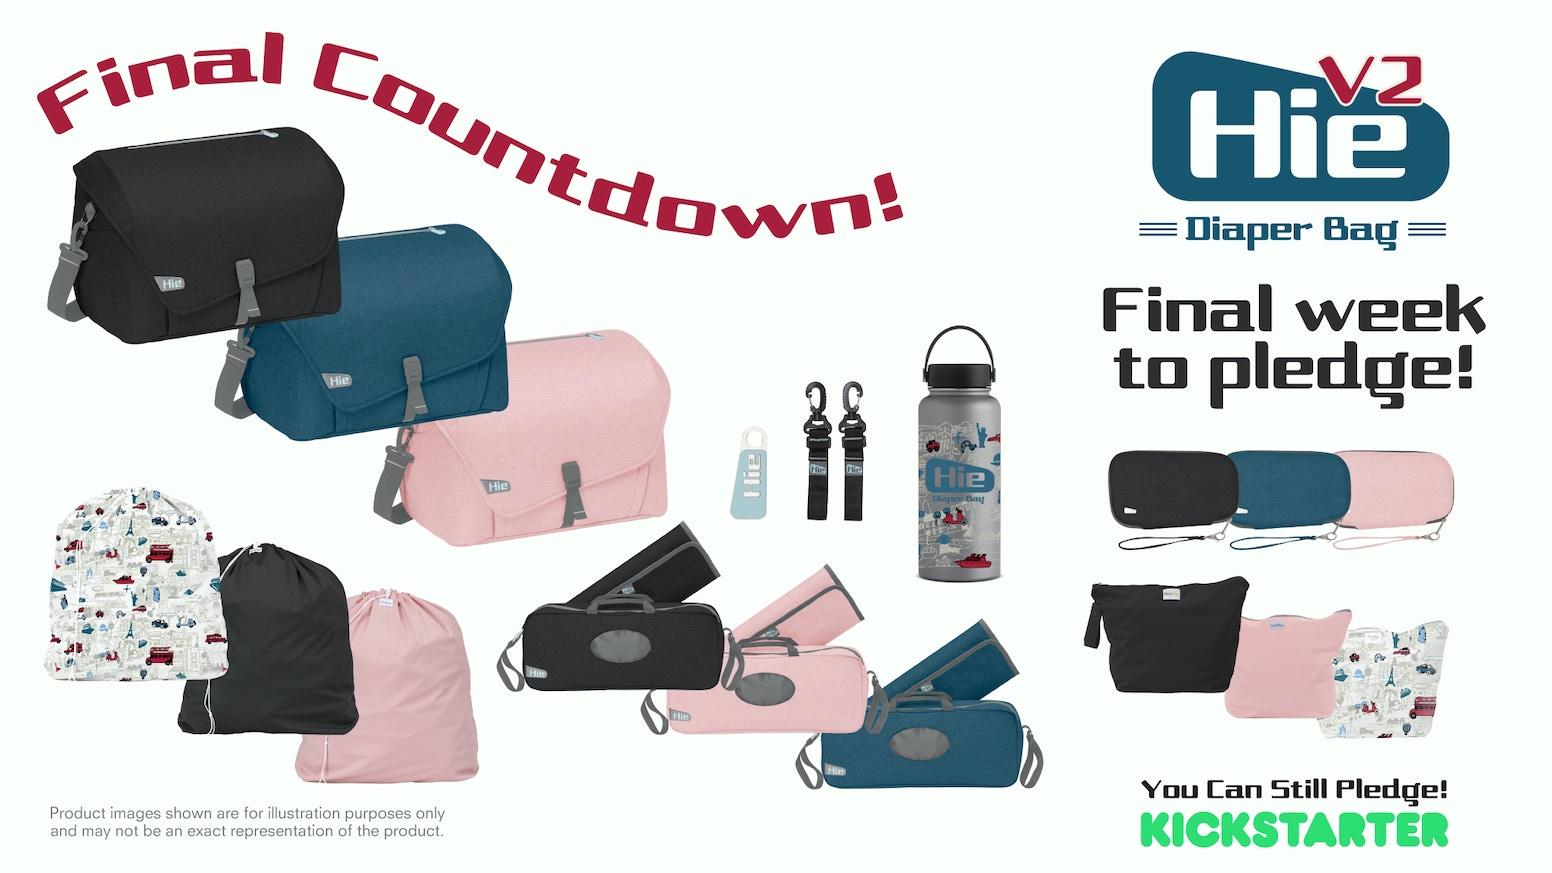 a33a5c8f288f0 Hie Bag V2 - Have Baby Will Travel by GroVia — Kickstarter